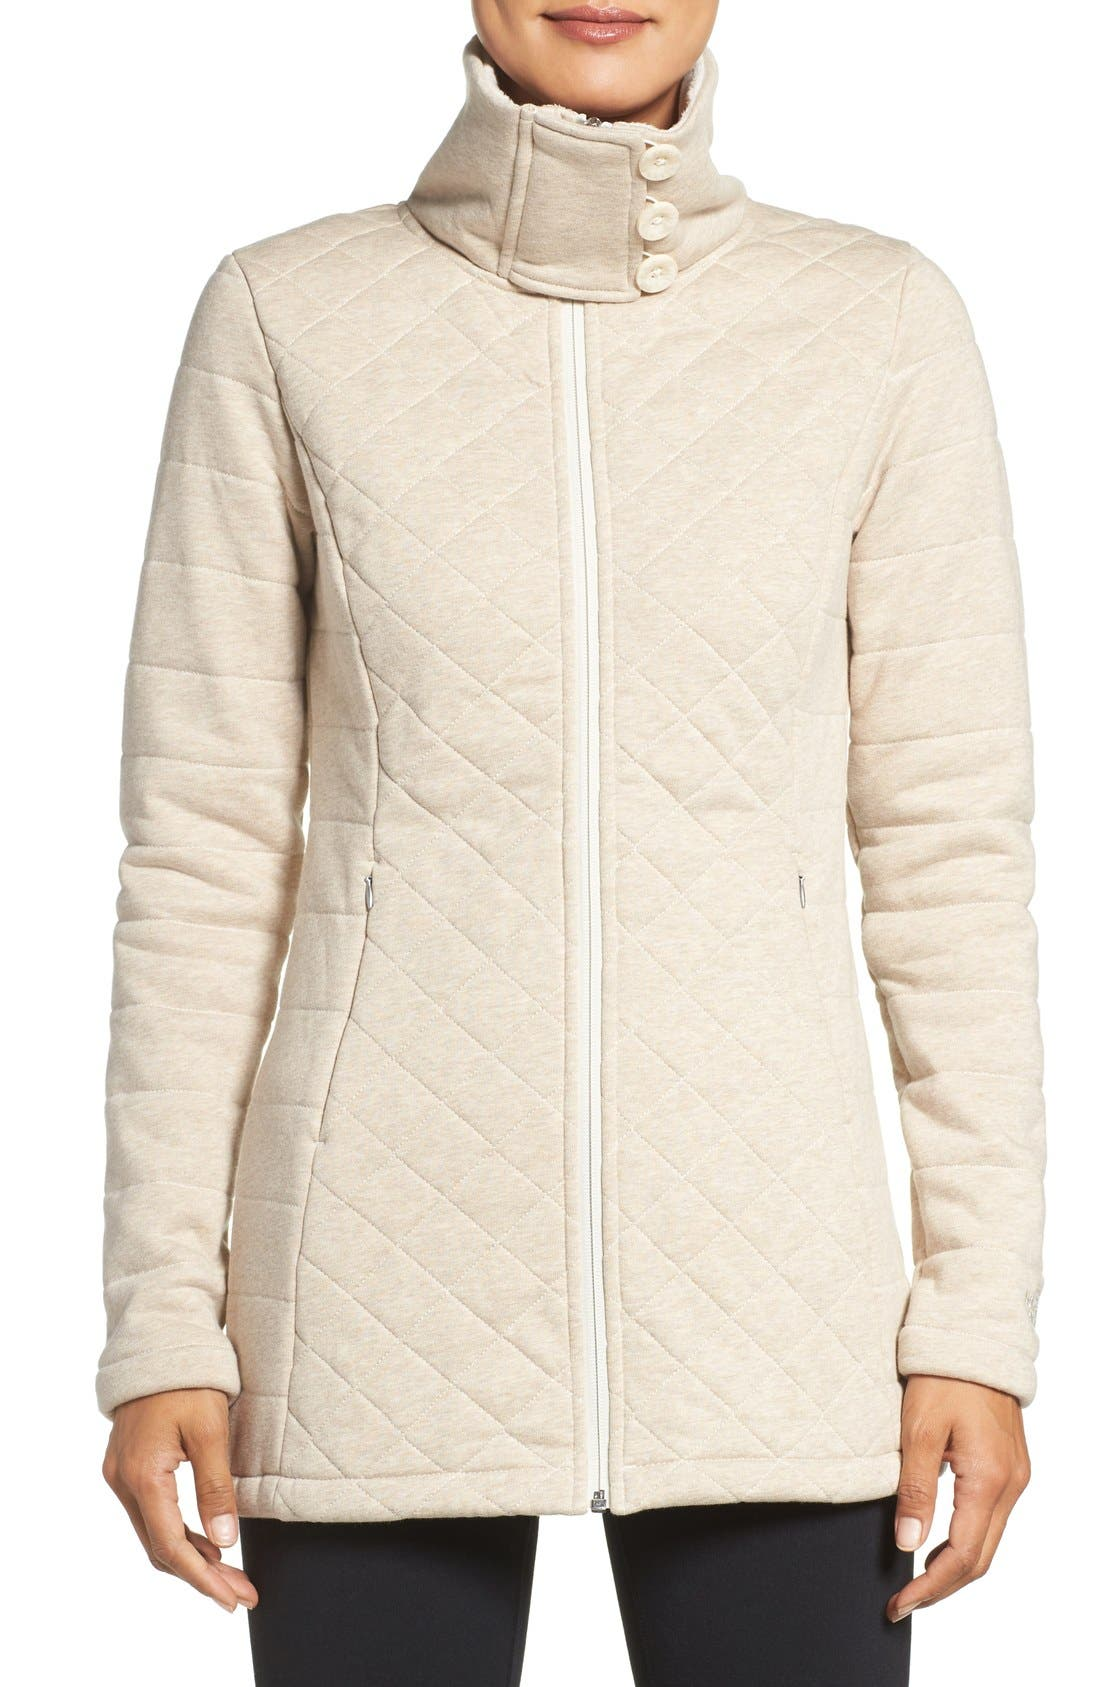 Main Image - The North Face 'Caroluna' Fleece Jacket